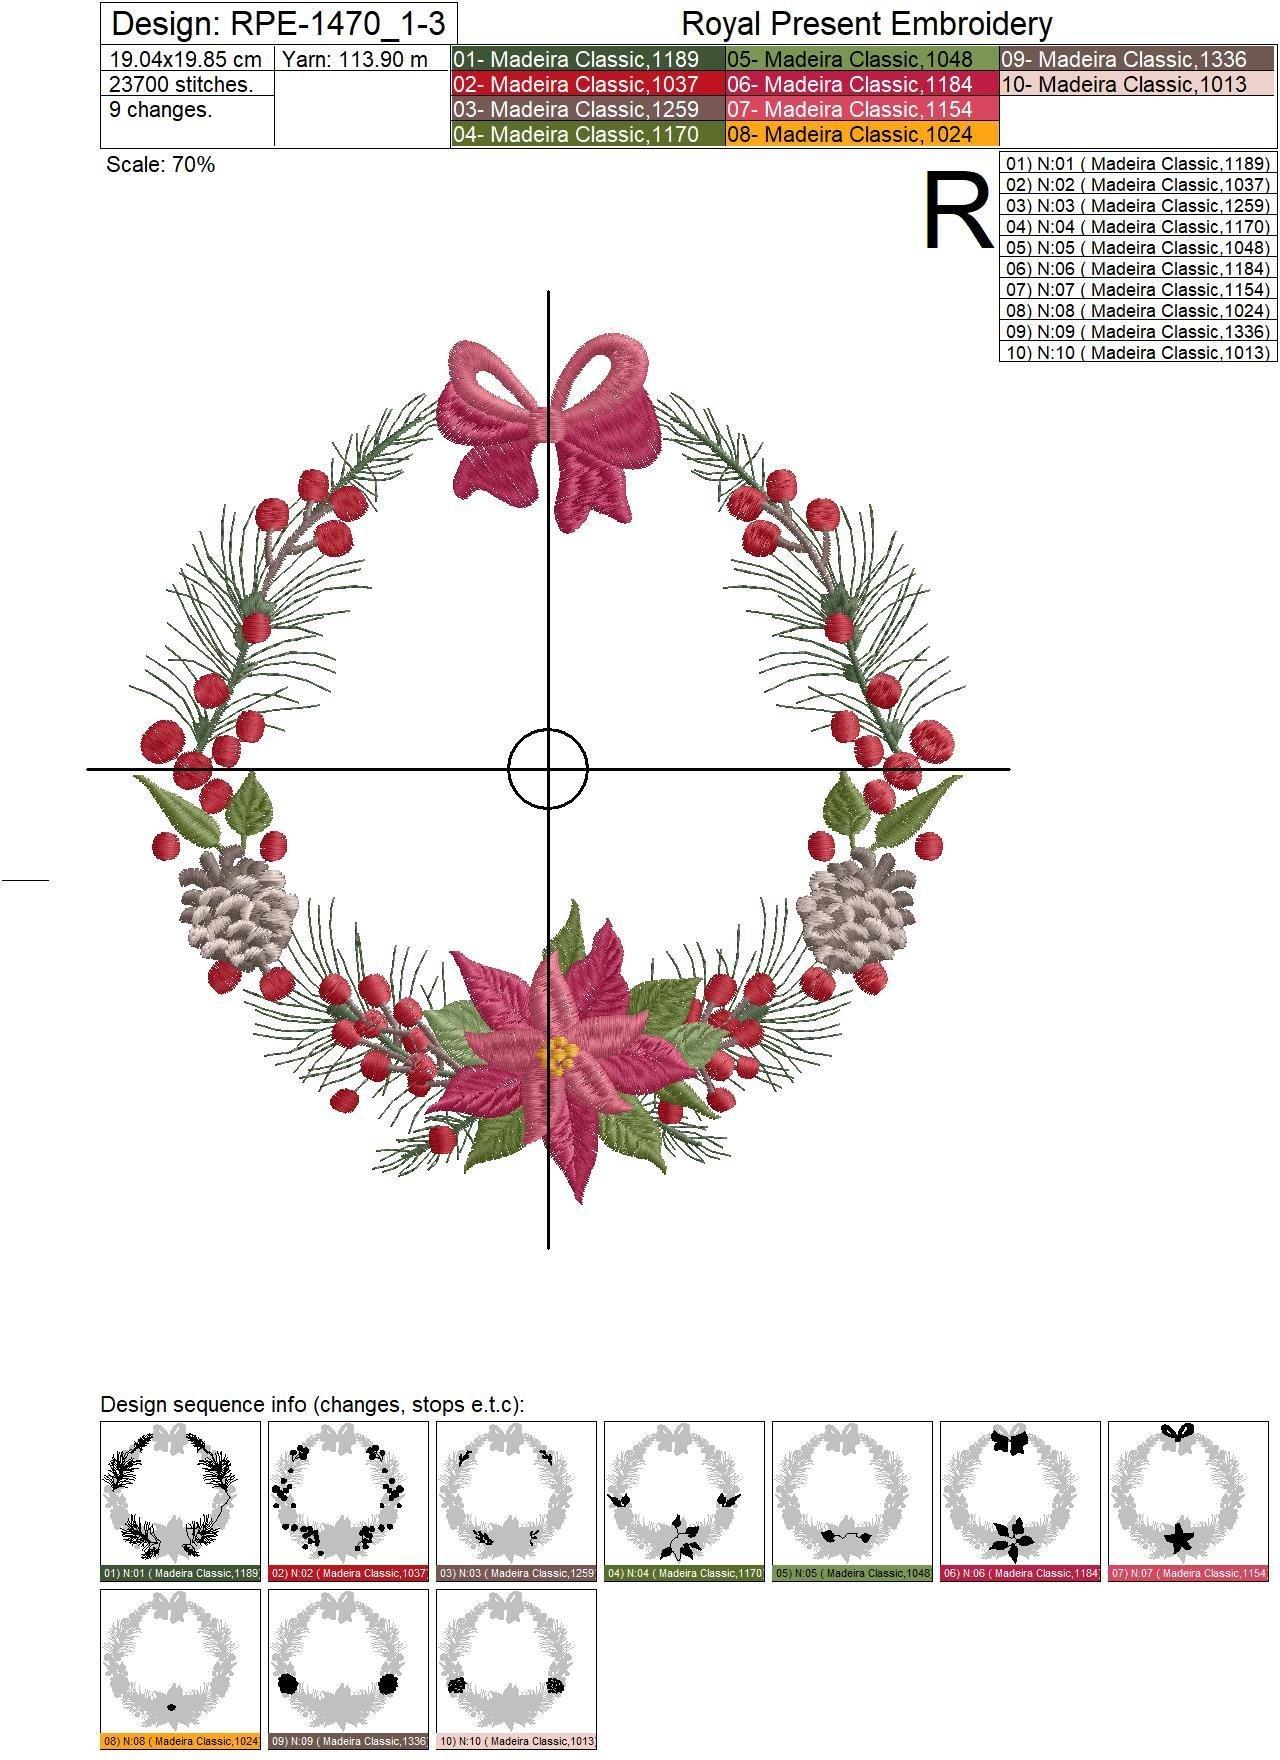 Christmas Festive Machine Embroidery Designs